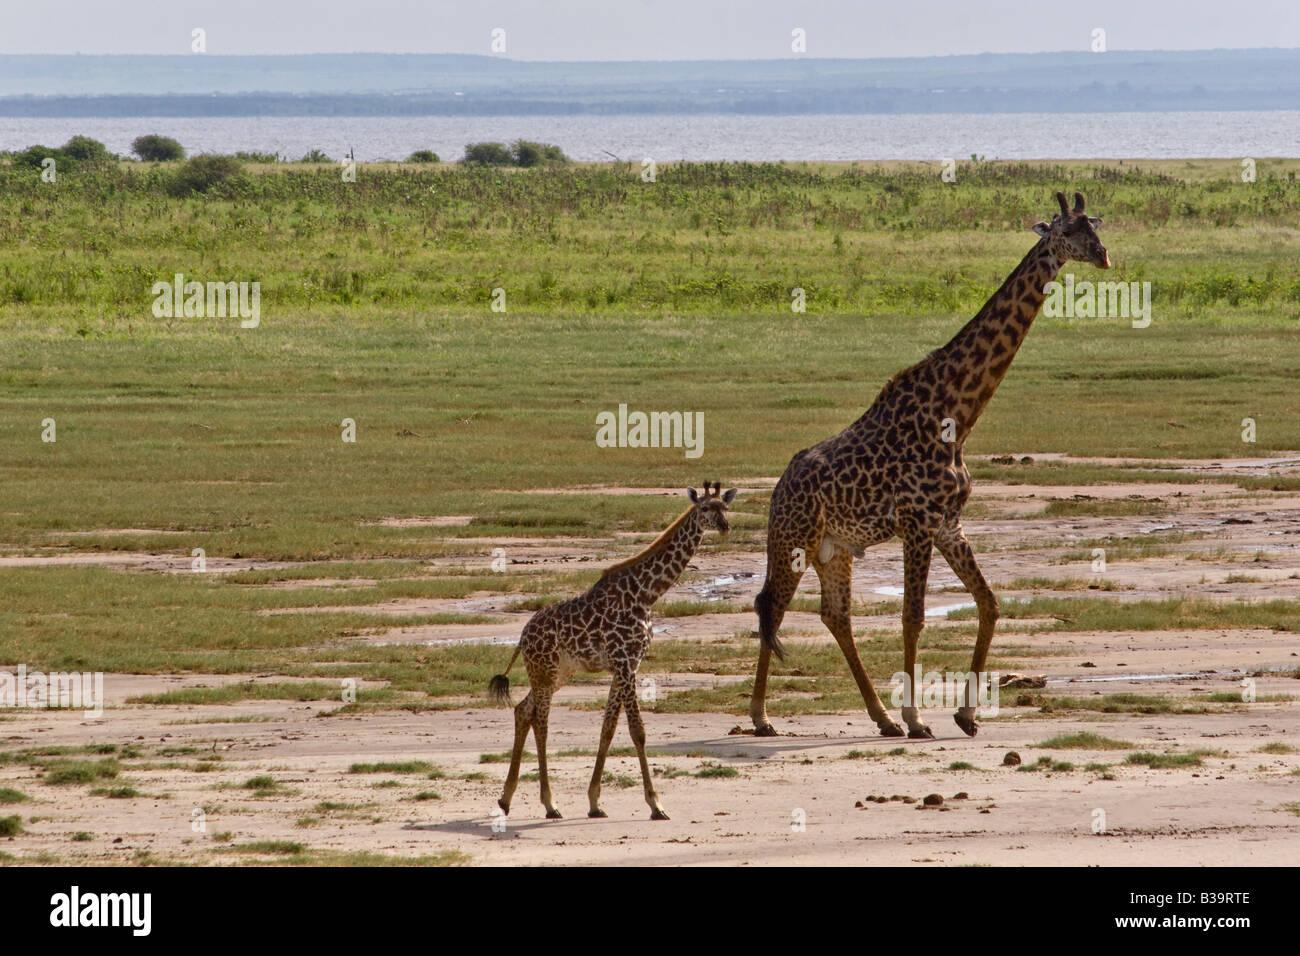 A mother and baby MASAI GIRAFFE Giraffa camelopardalis tippelskirchi LAKE MANYARA NATIONAL PARK TANZANIA - Stock Image